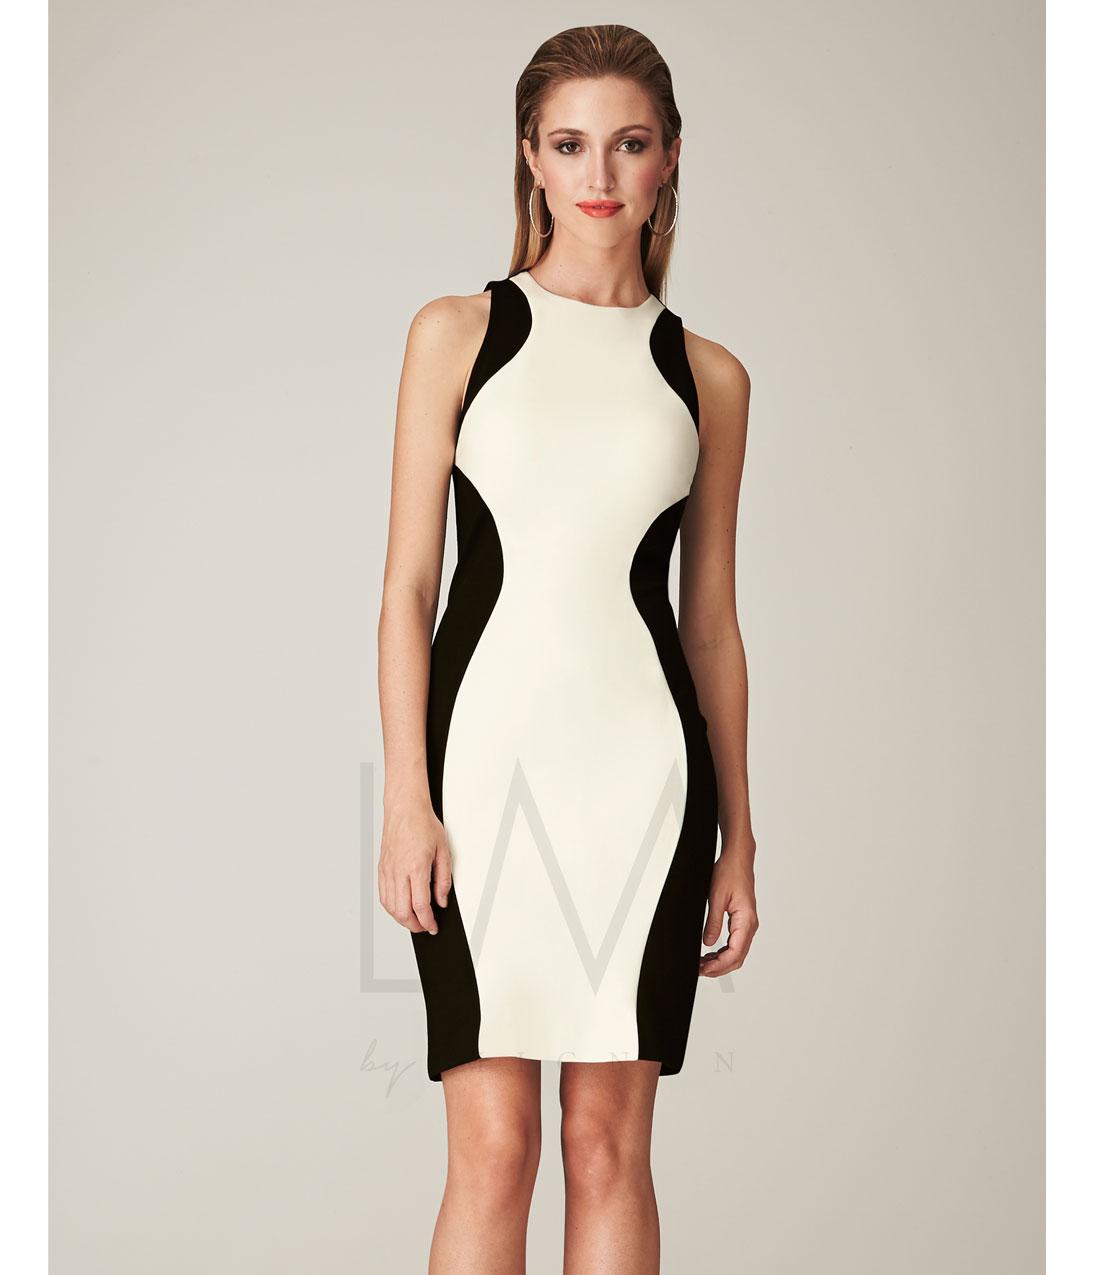 Dress white and black